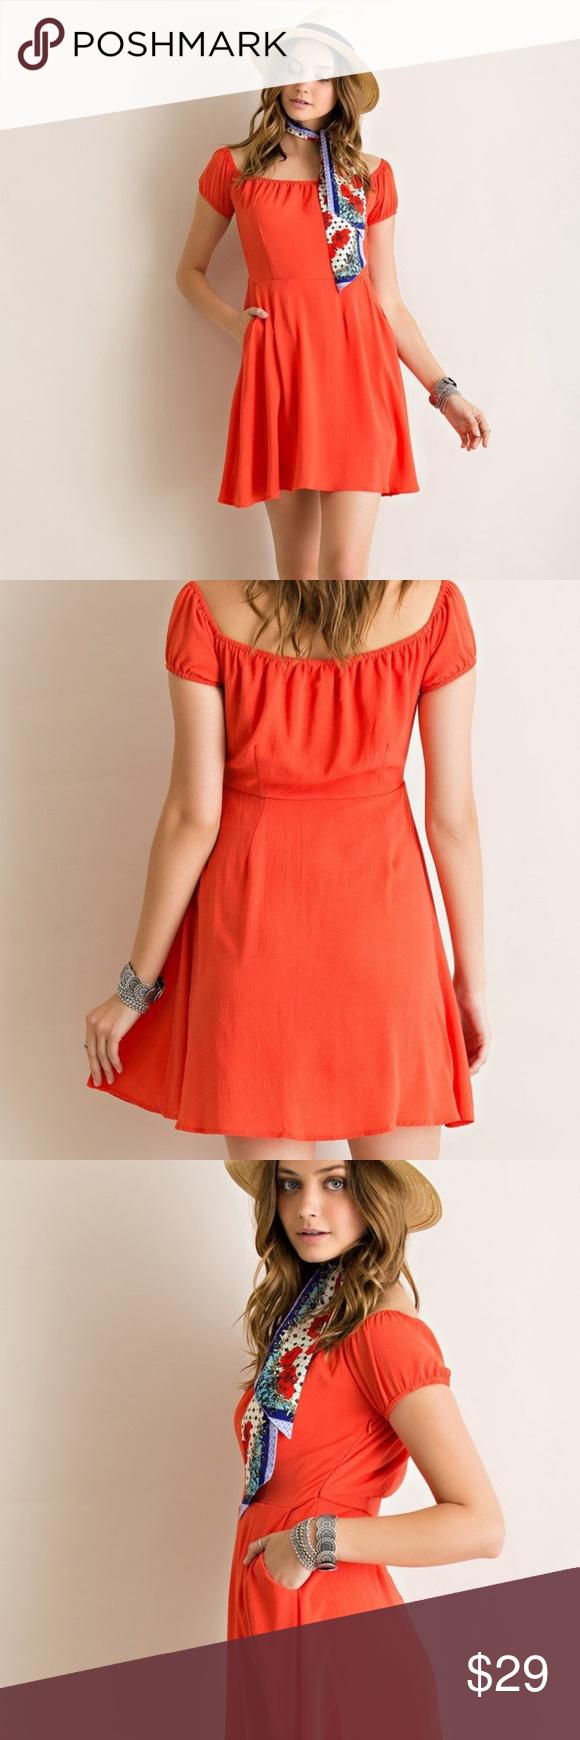 New Entro Off Shoulder Dress Crepe Fabric Lined Crepe Dress Dresses Off Shoulder Dress